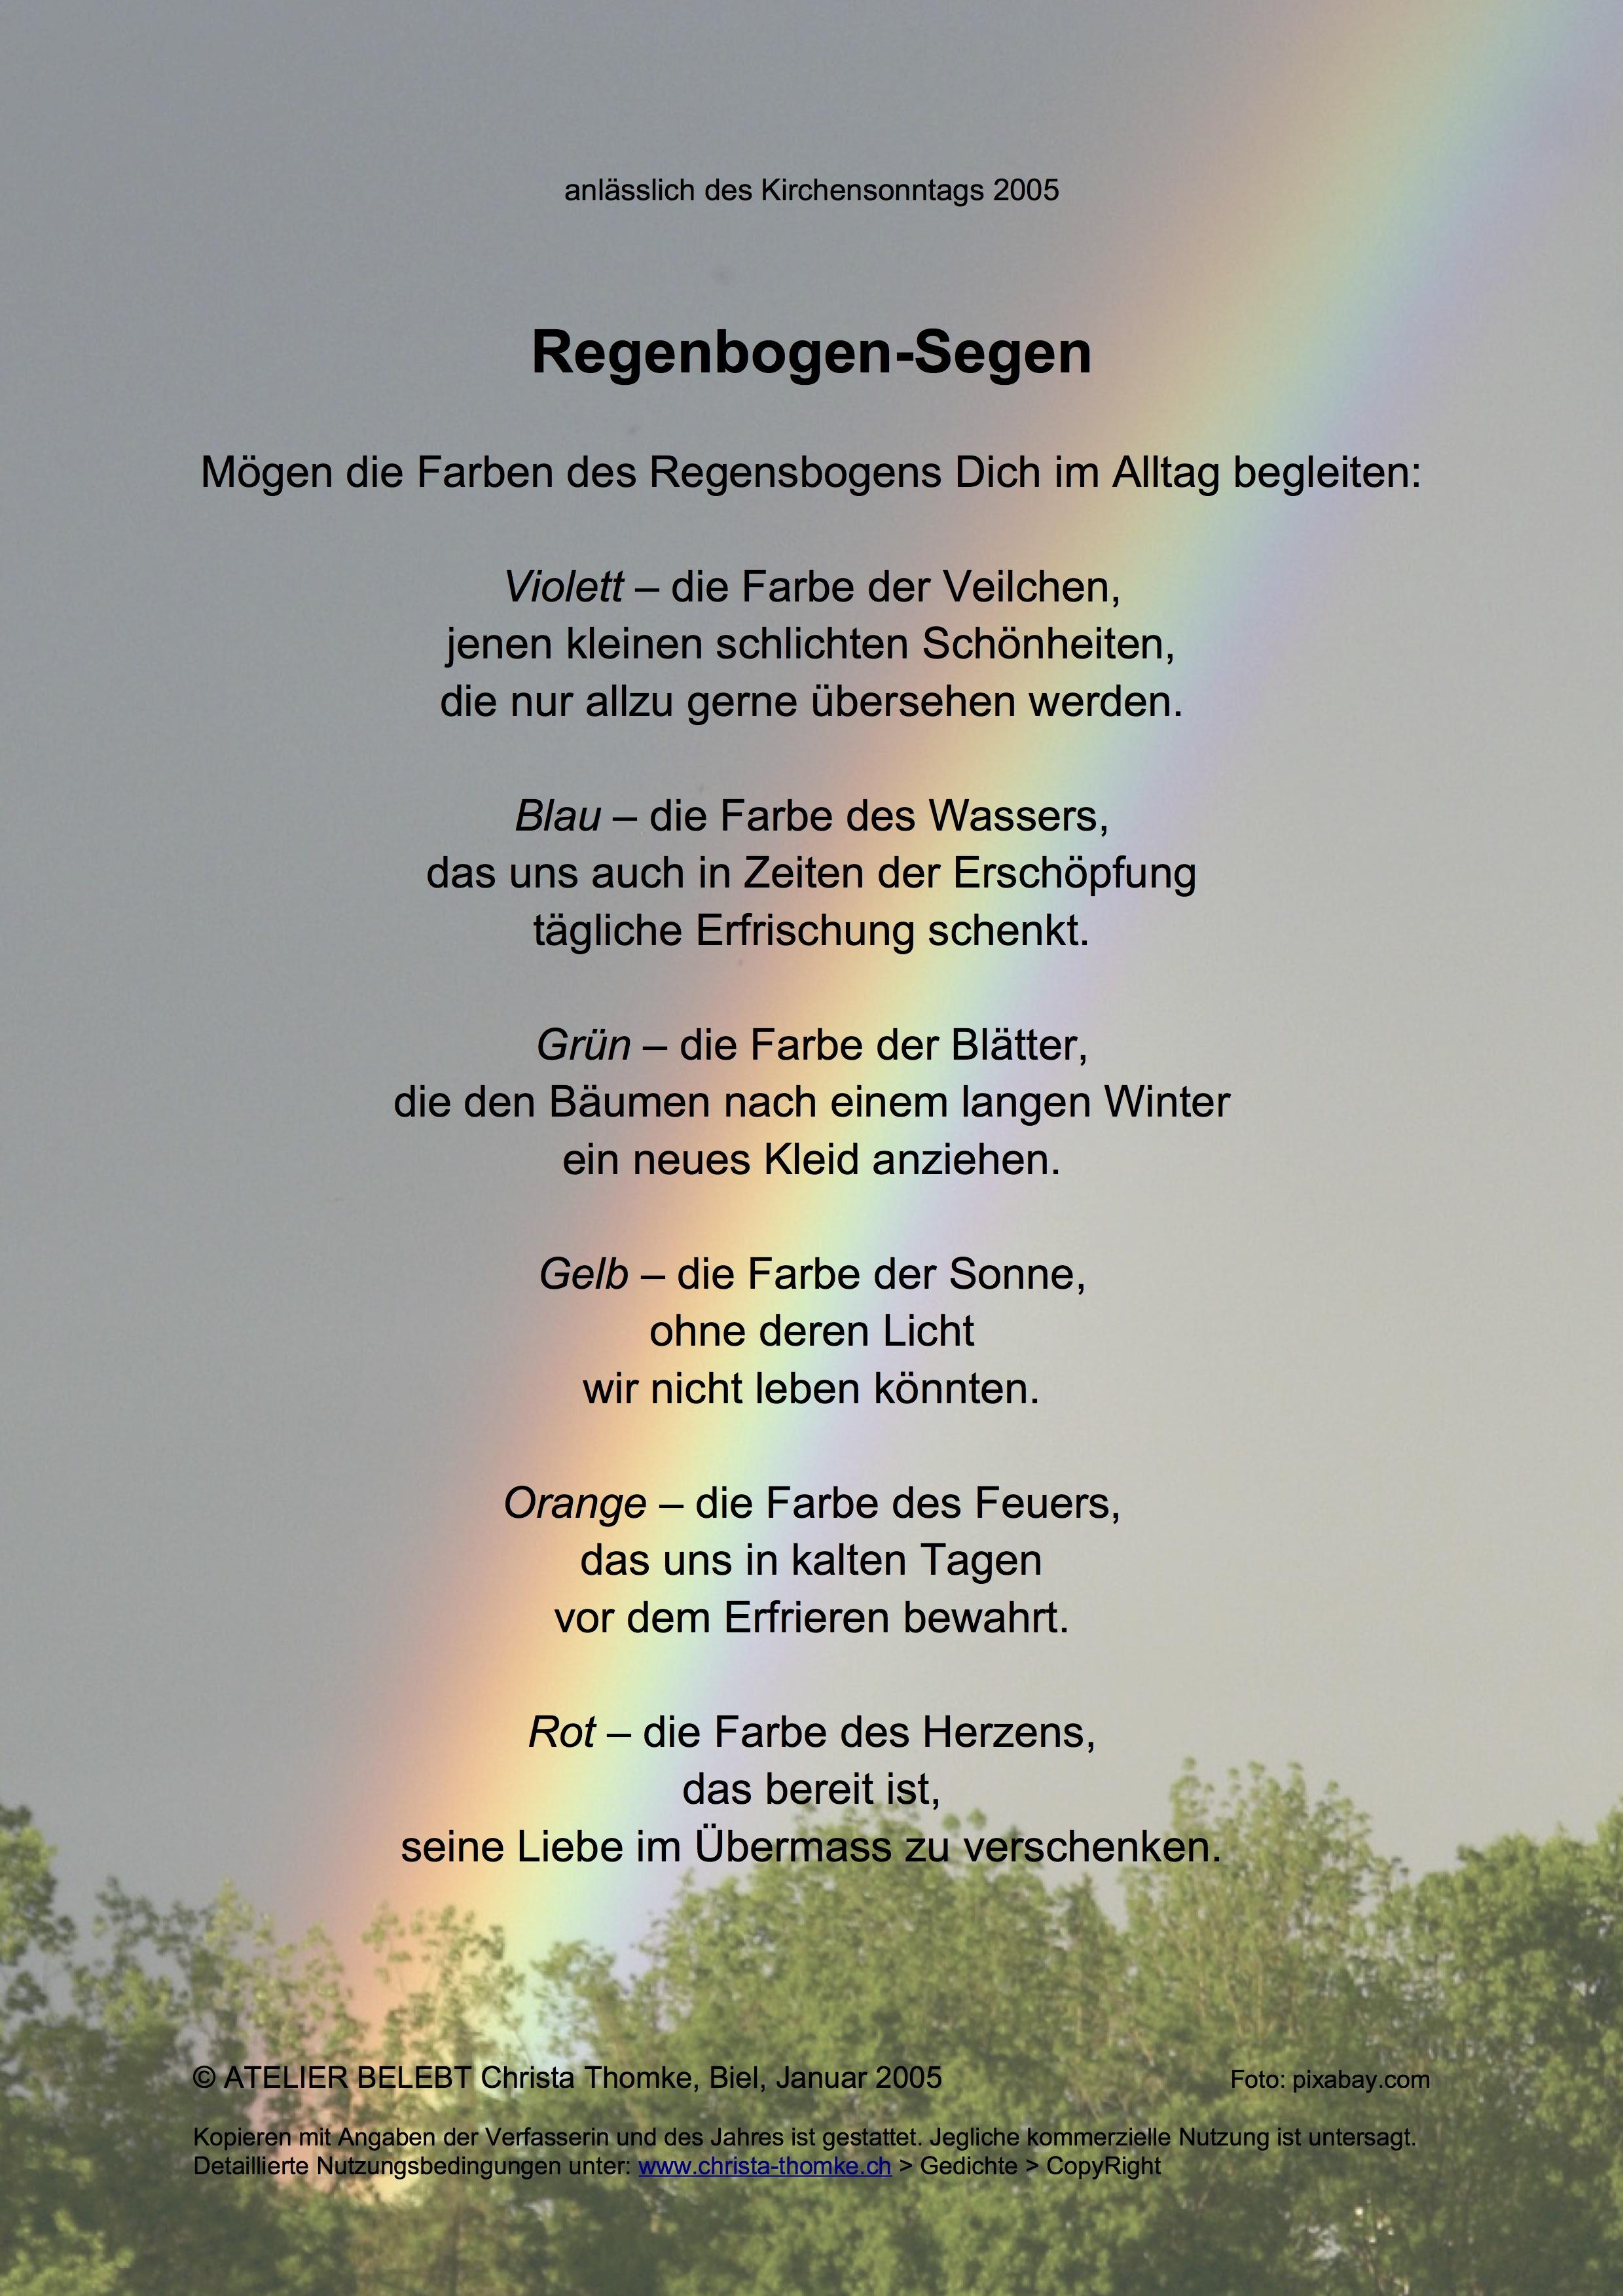 Regenbogen-Segen / @ Christa Thomke